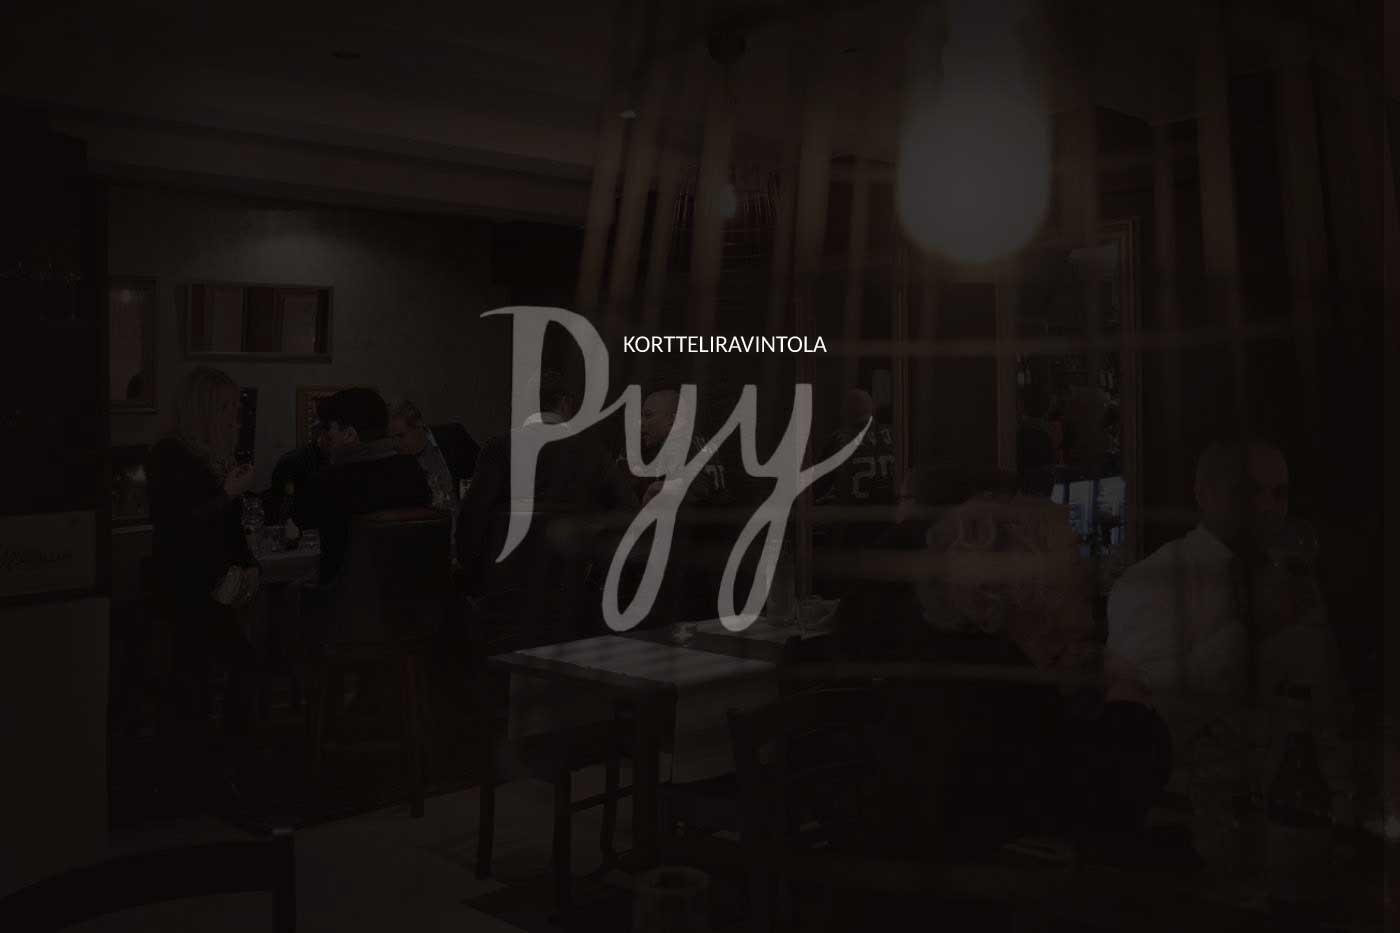 Ravintola Pyy